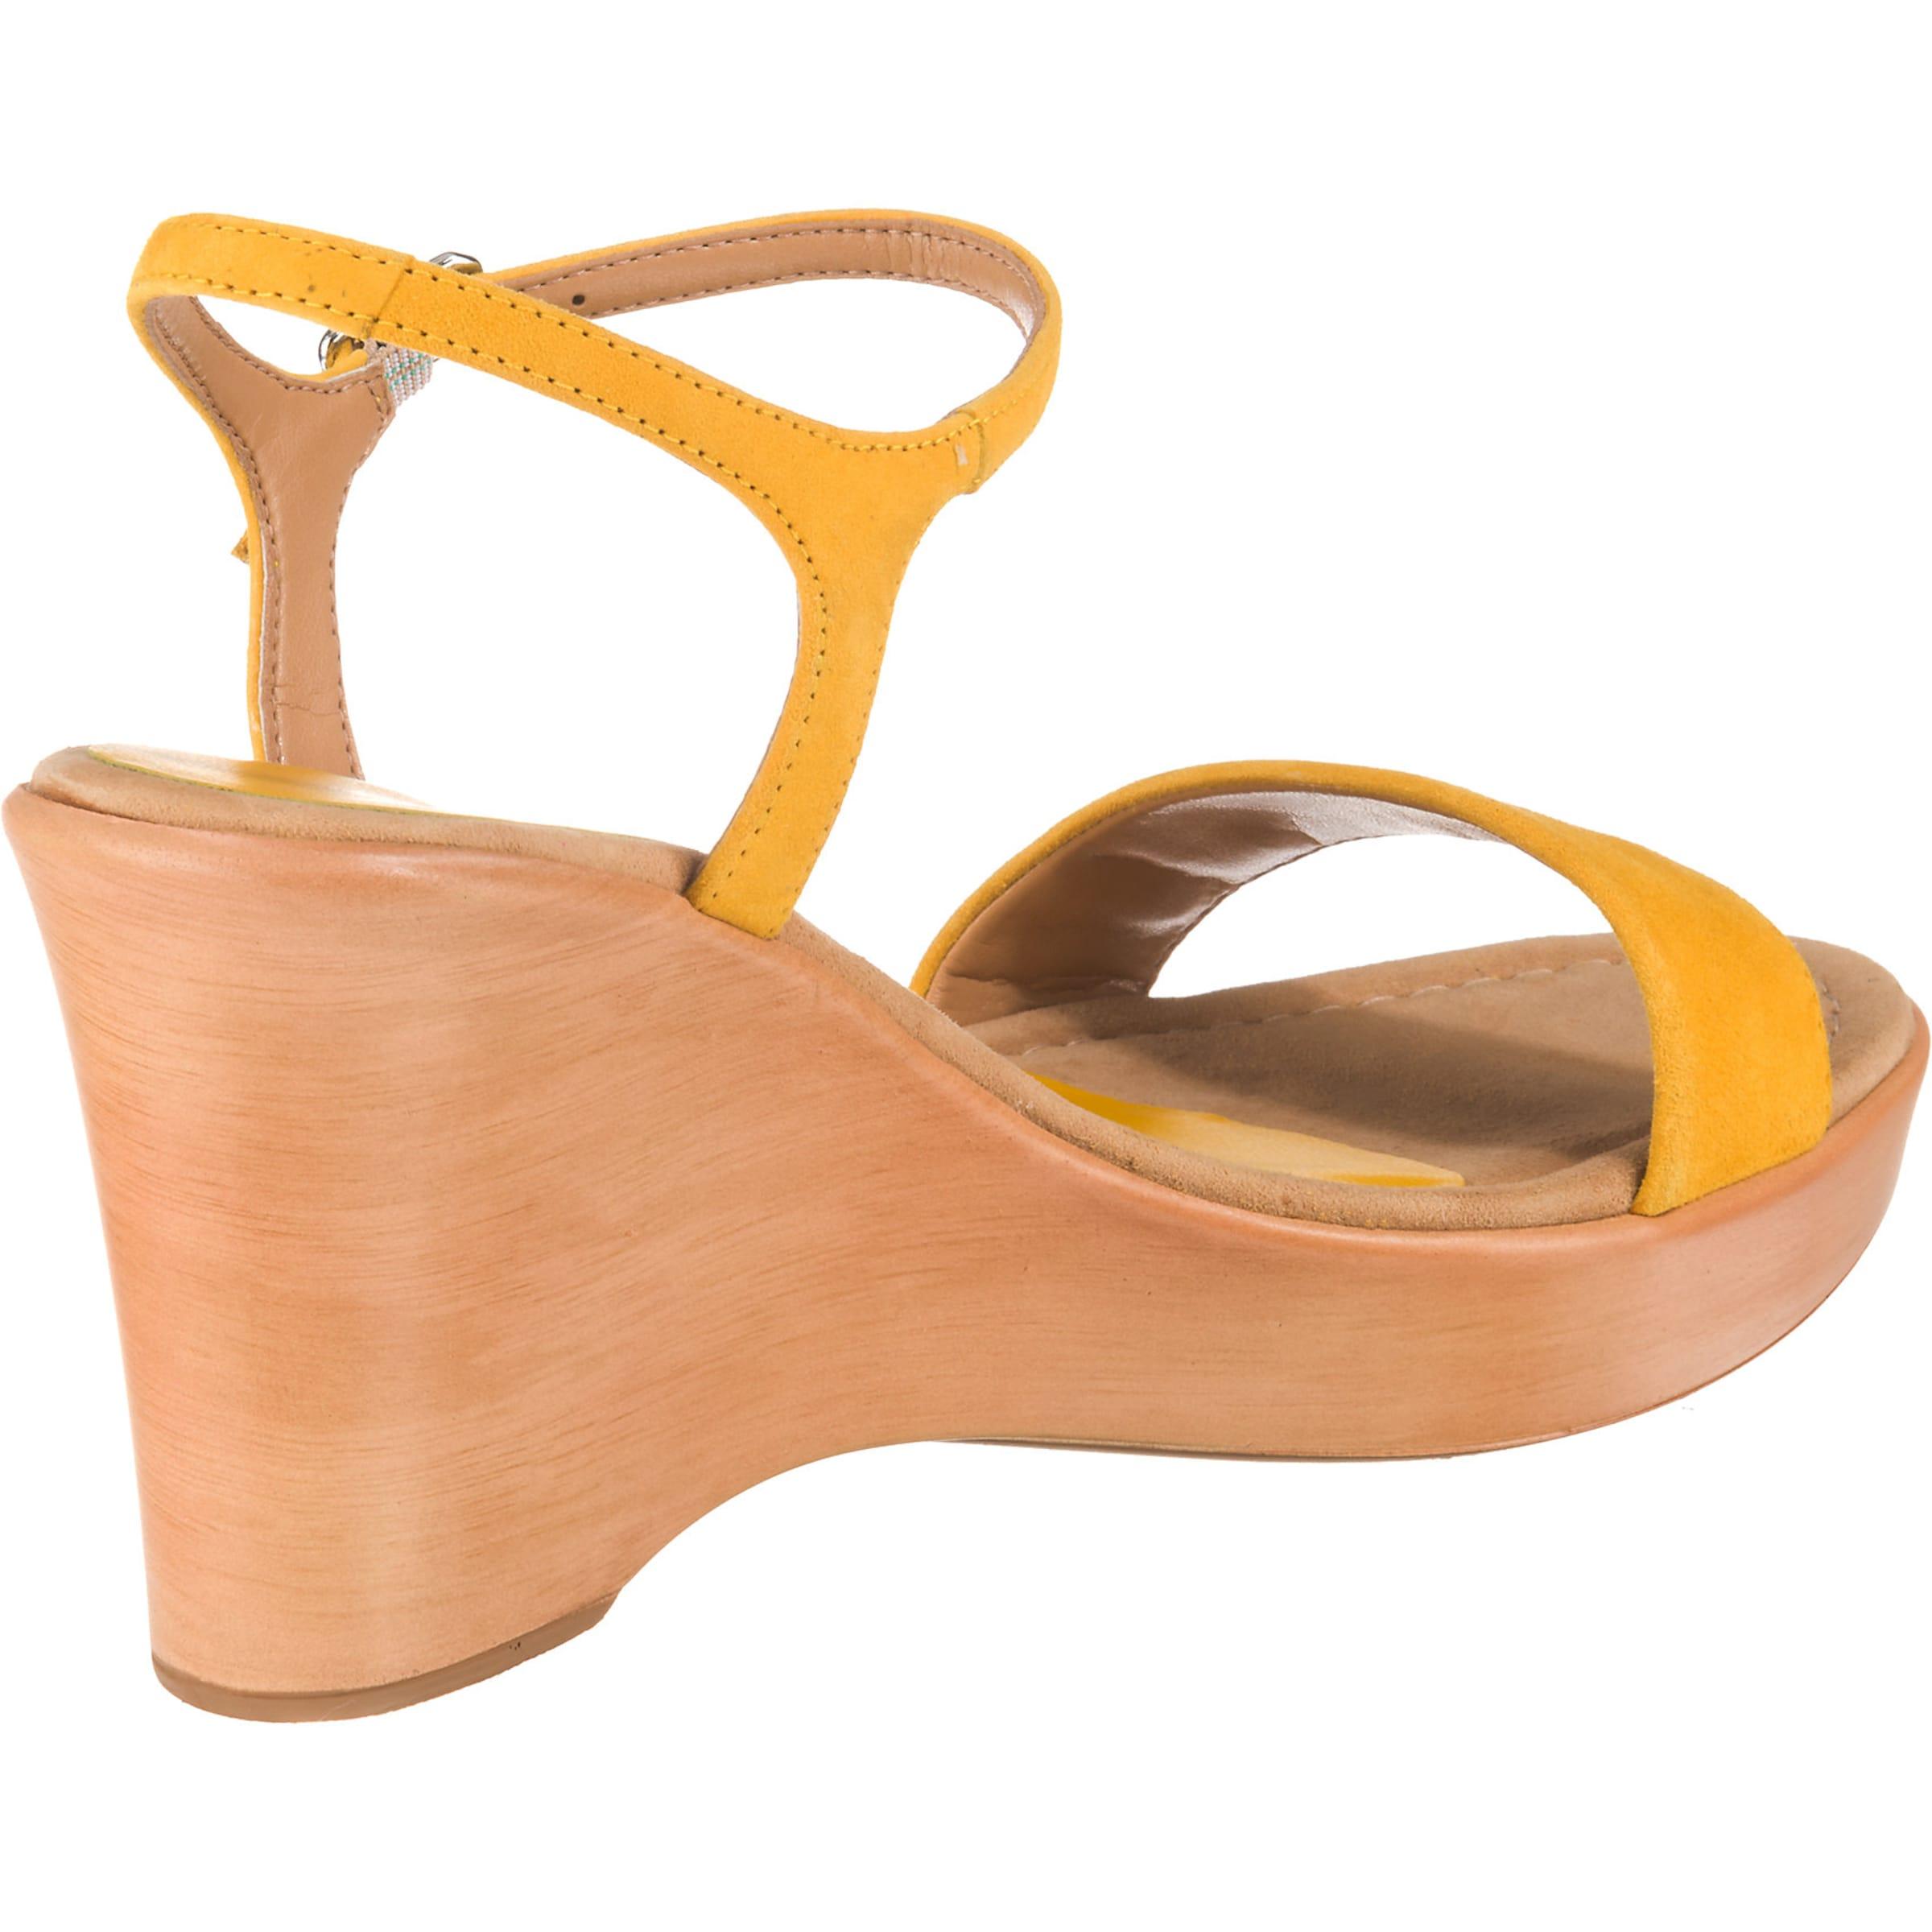 Goldgelb Unisa Unisa Sandaletten Unisa In Sandaletten Sandaletten In Goldgelb rCBoxeWd